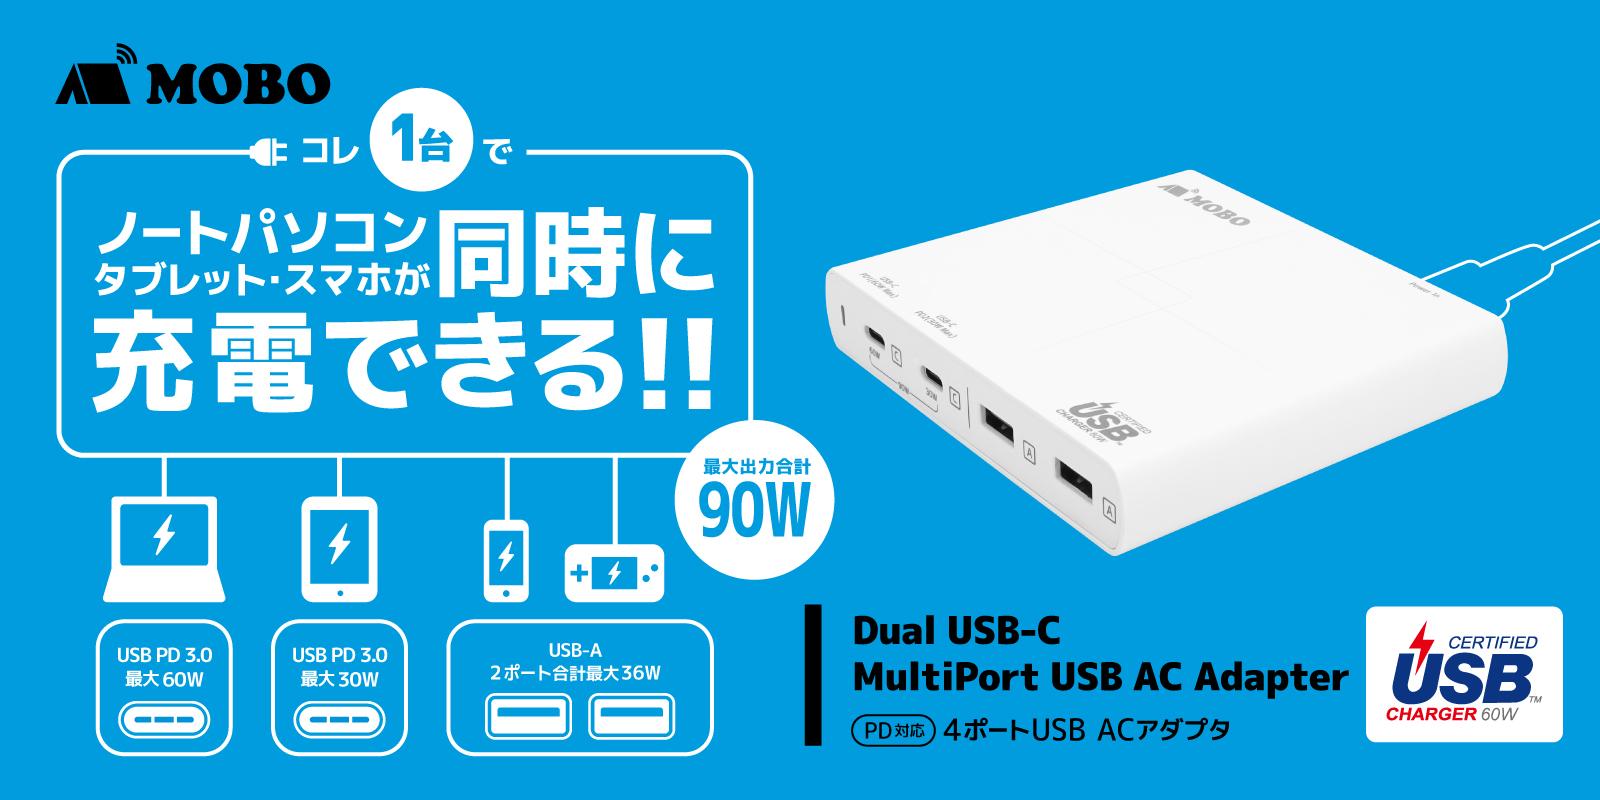 USB-C-MultiPort-USBACAdapter